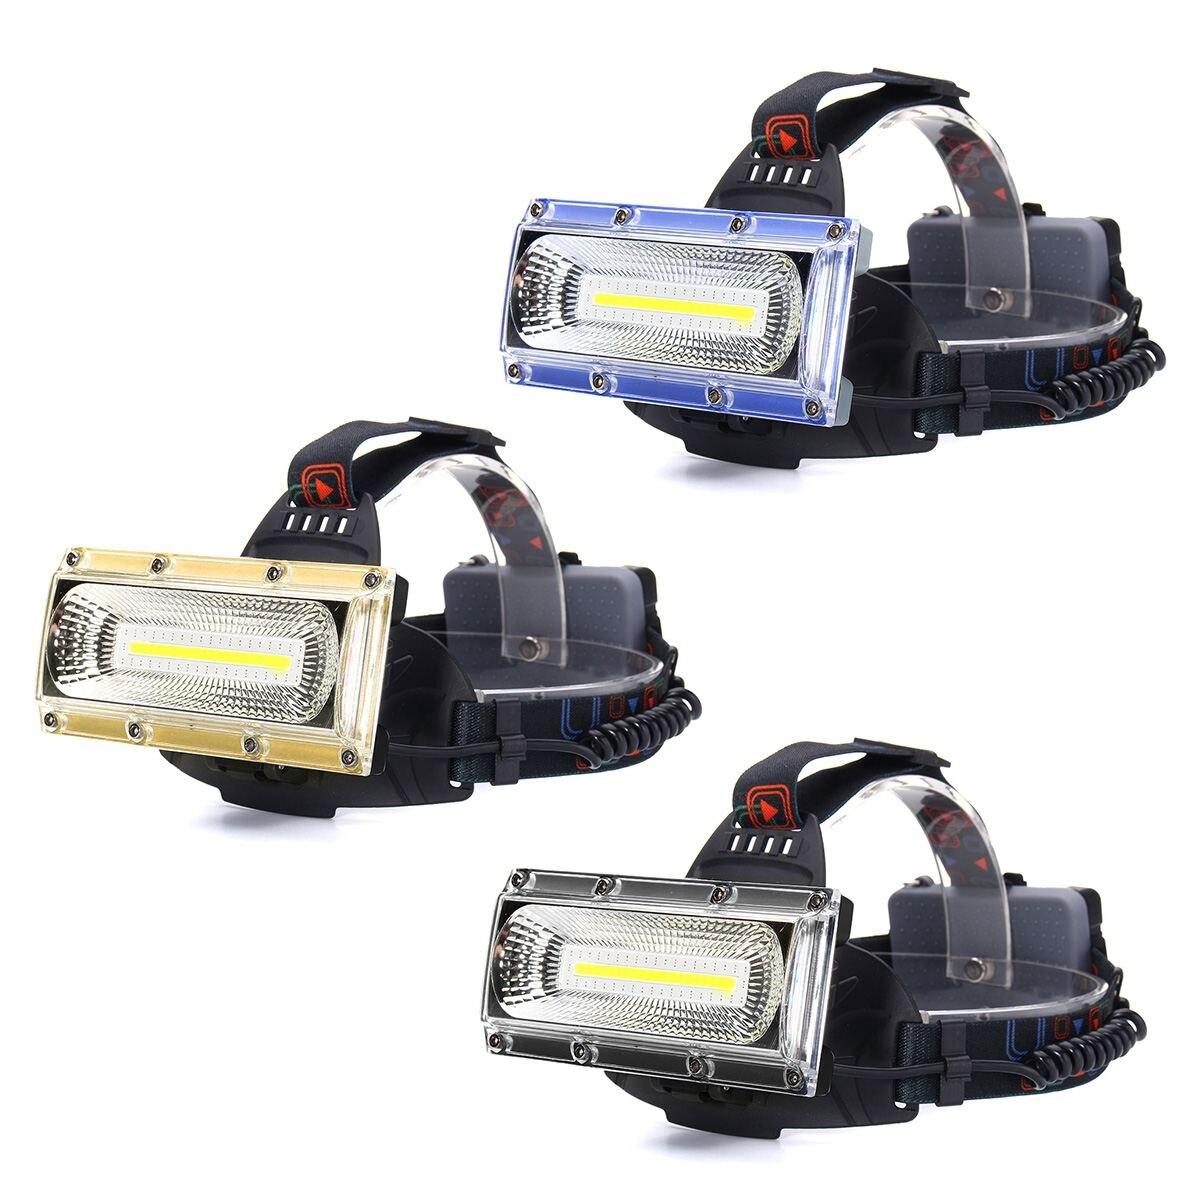 1300LM 30W COB LED Headlamp Three Lighting Modes Adjustable Base for MTB Bike Cycling 18650 Led Lights with Headband Daily Use